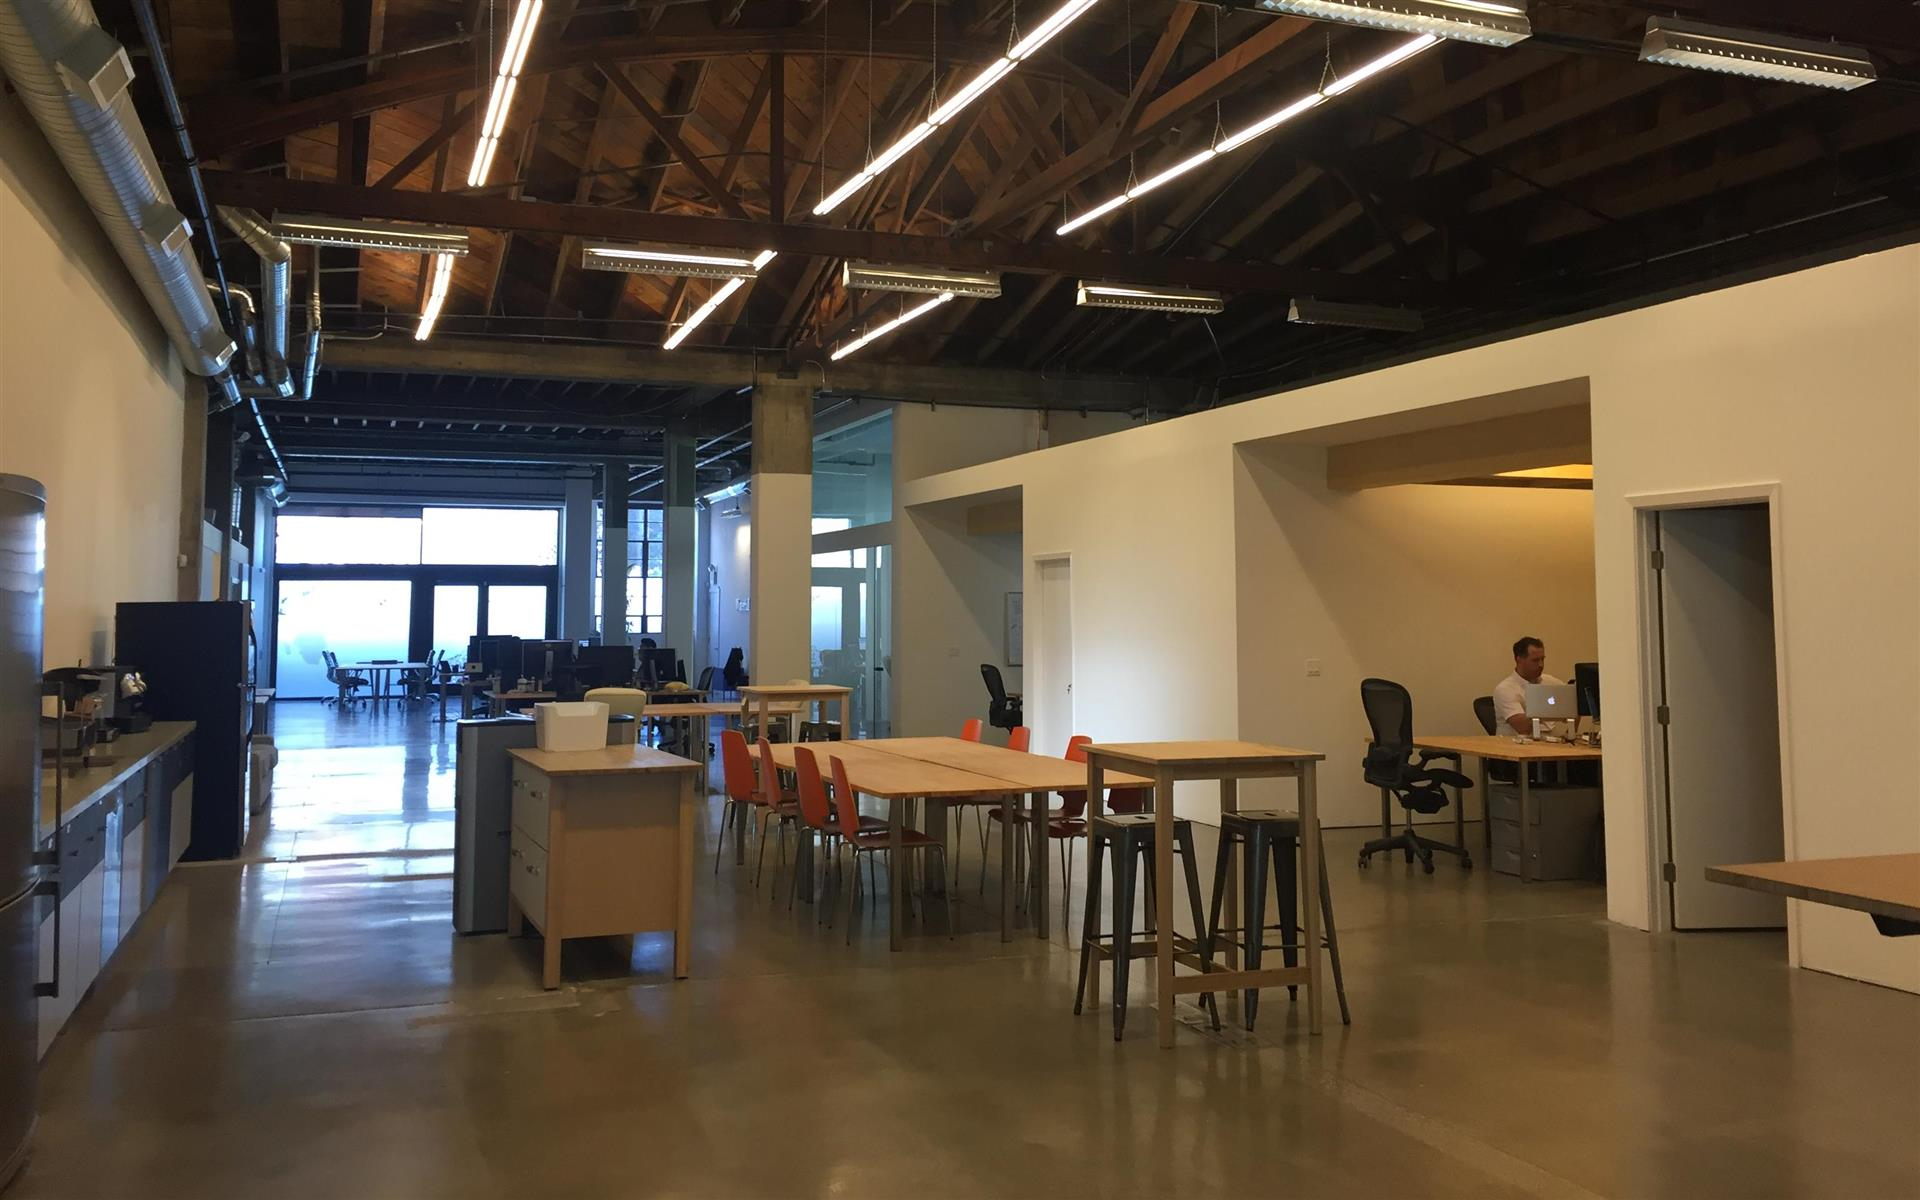 Waterfall International Inc. - Desks in shared, quiet open work space